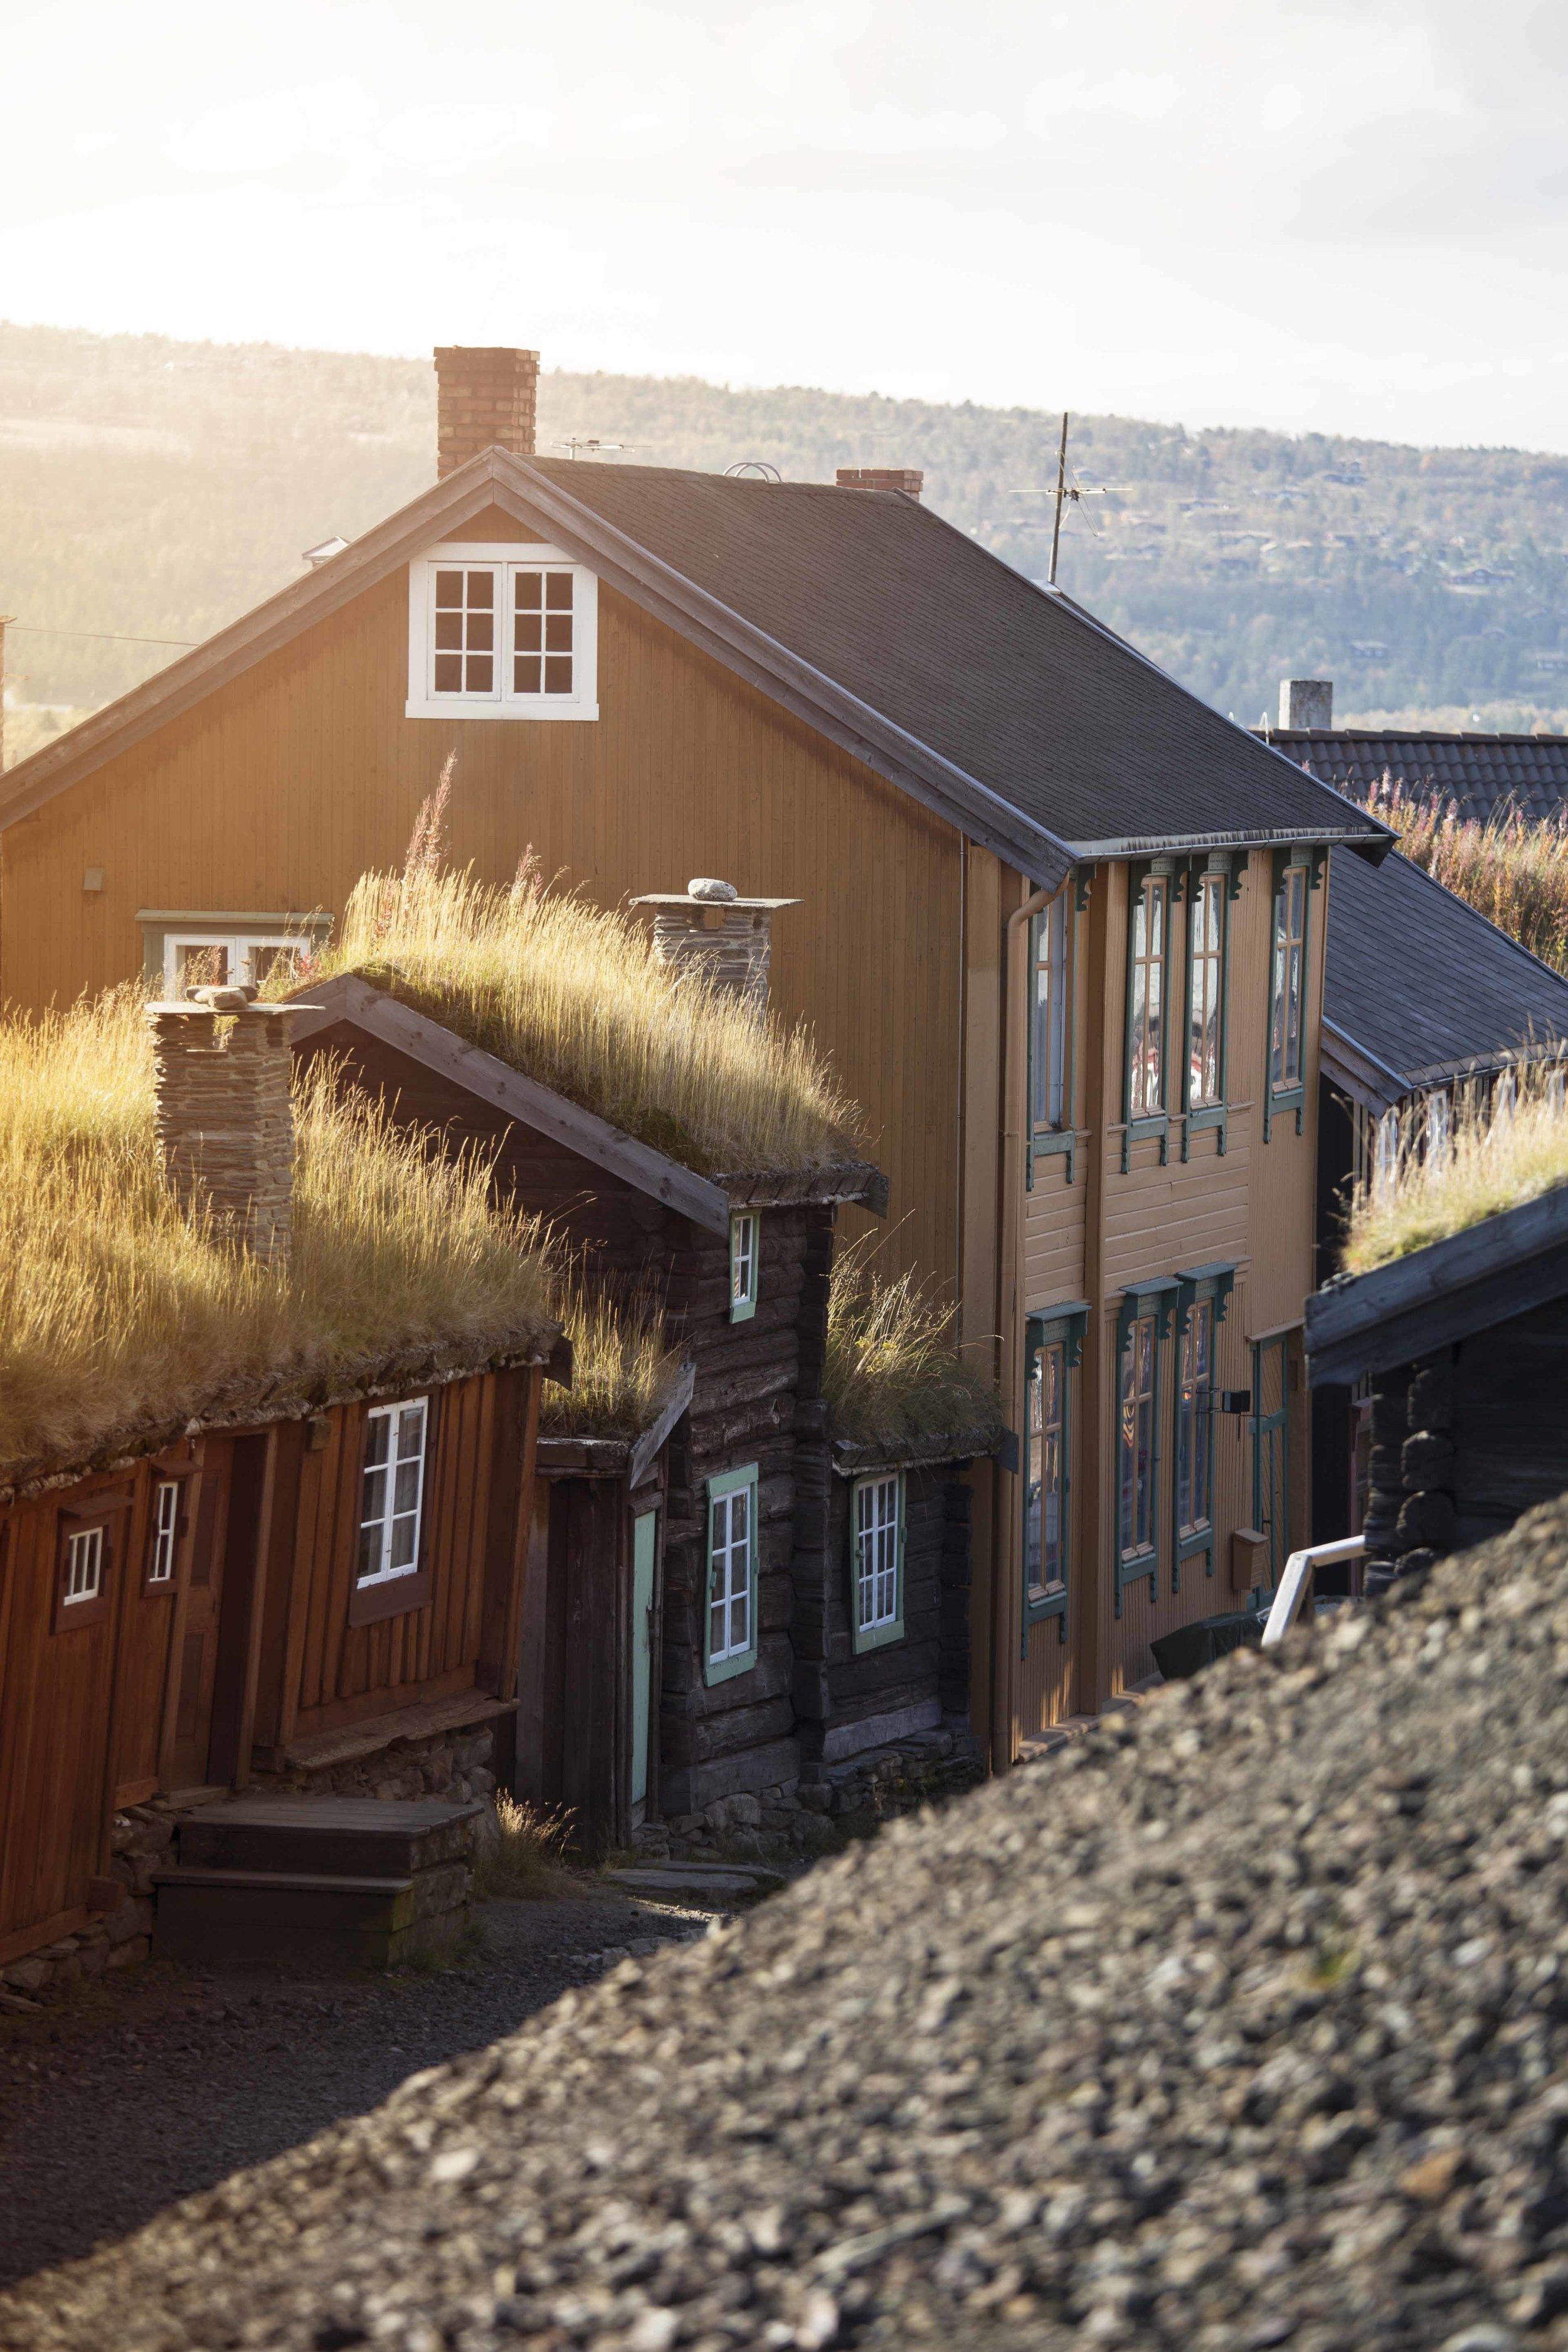 røros - Røros, Sleggveien med Ola Mæla-stuggu, et laftet våningshus fra 1800-tallet